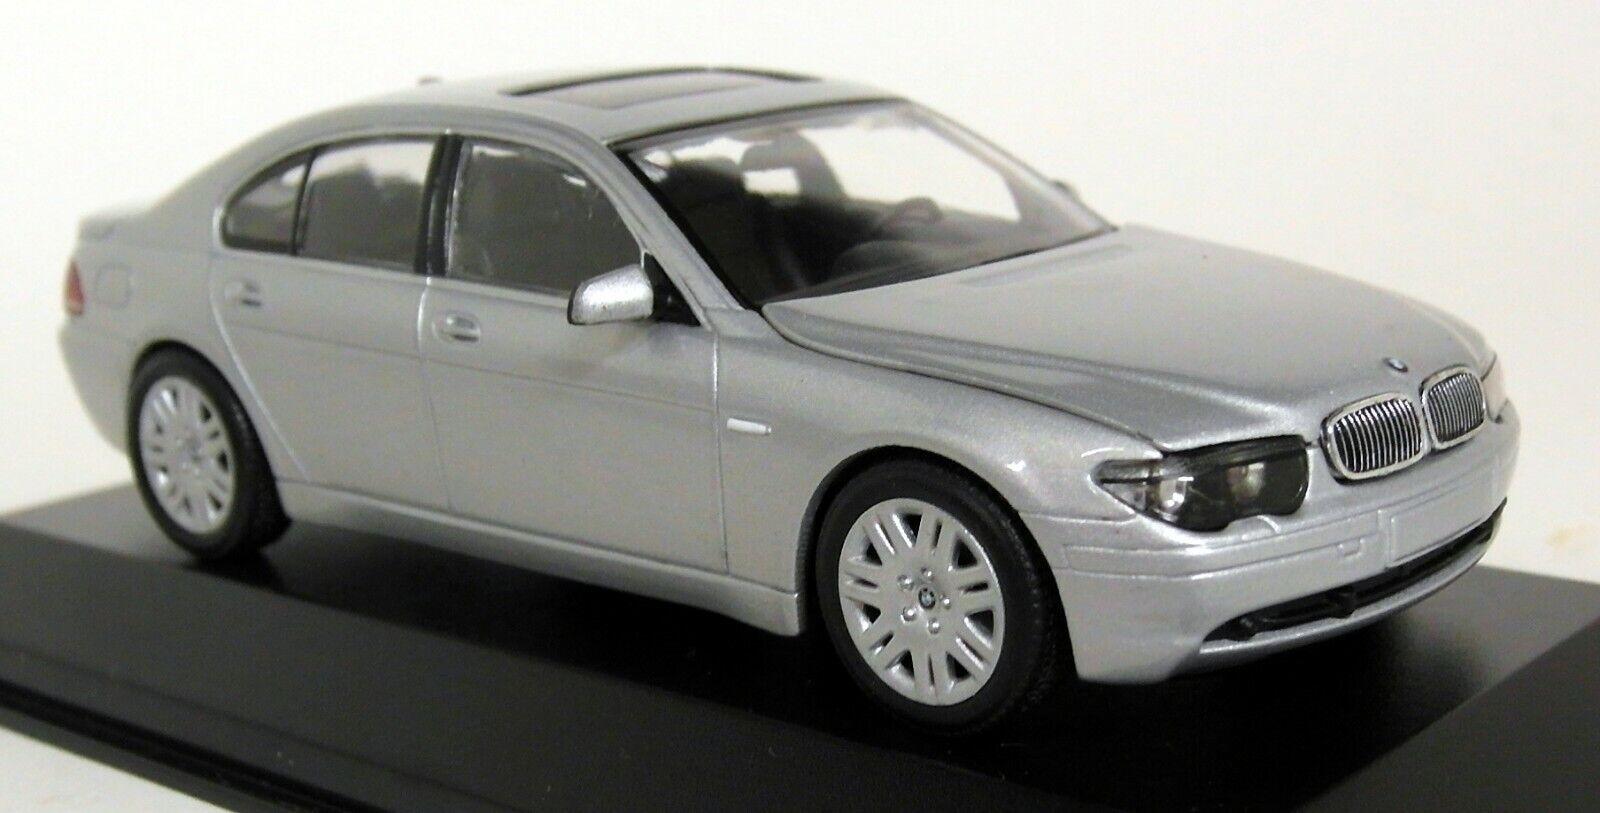 Minichamps 143 SCALA 431 020200 BMW 7 Series 2001 argentoo E65 Auto modellolo Diecast